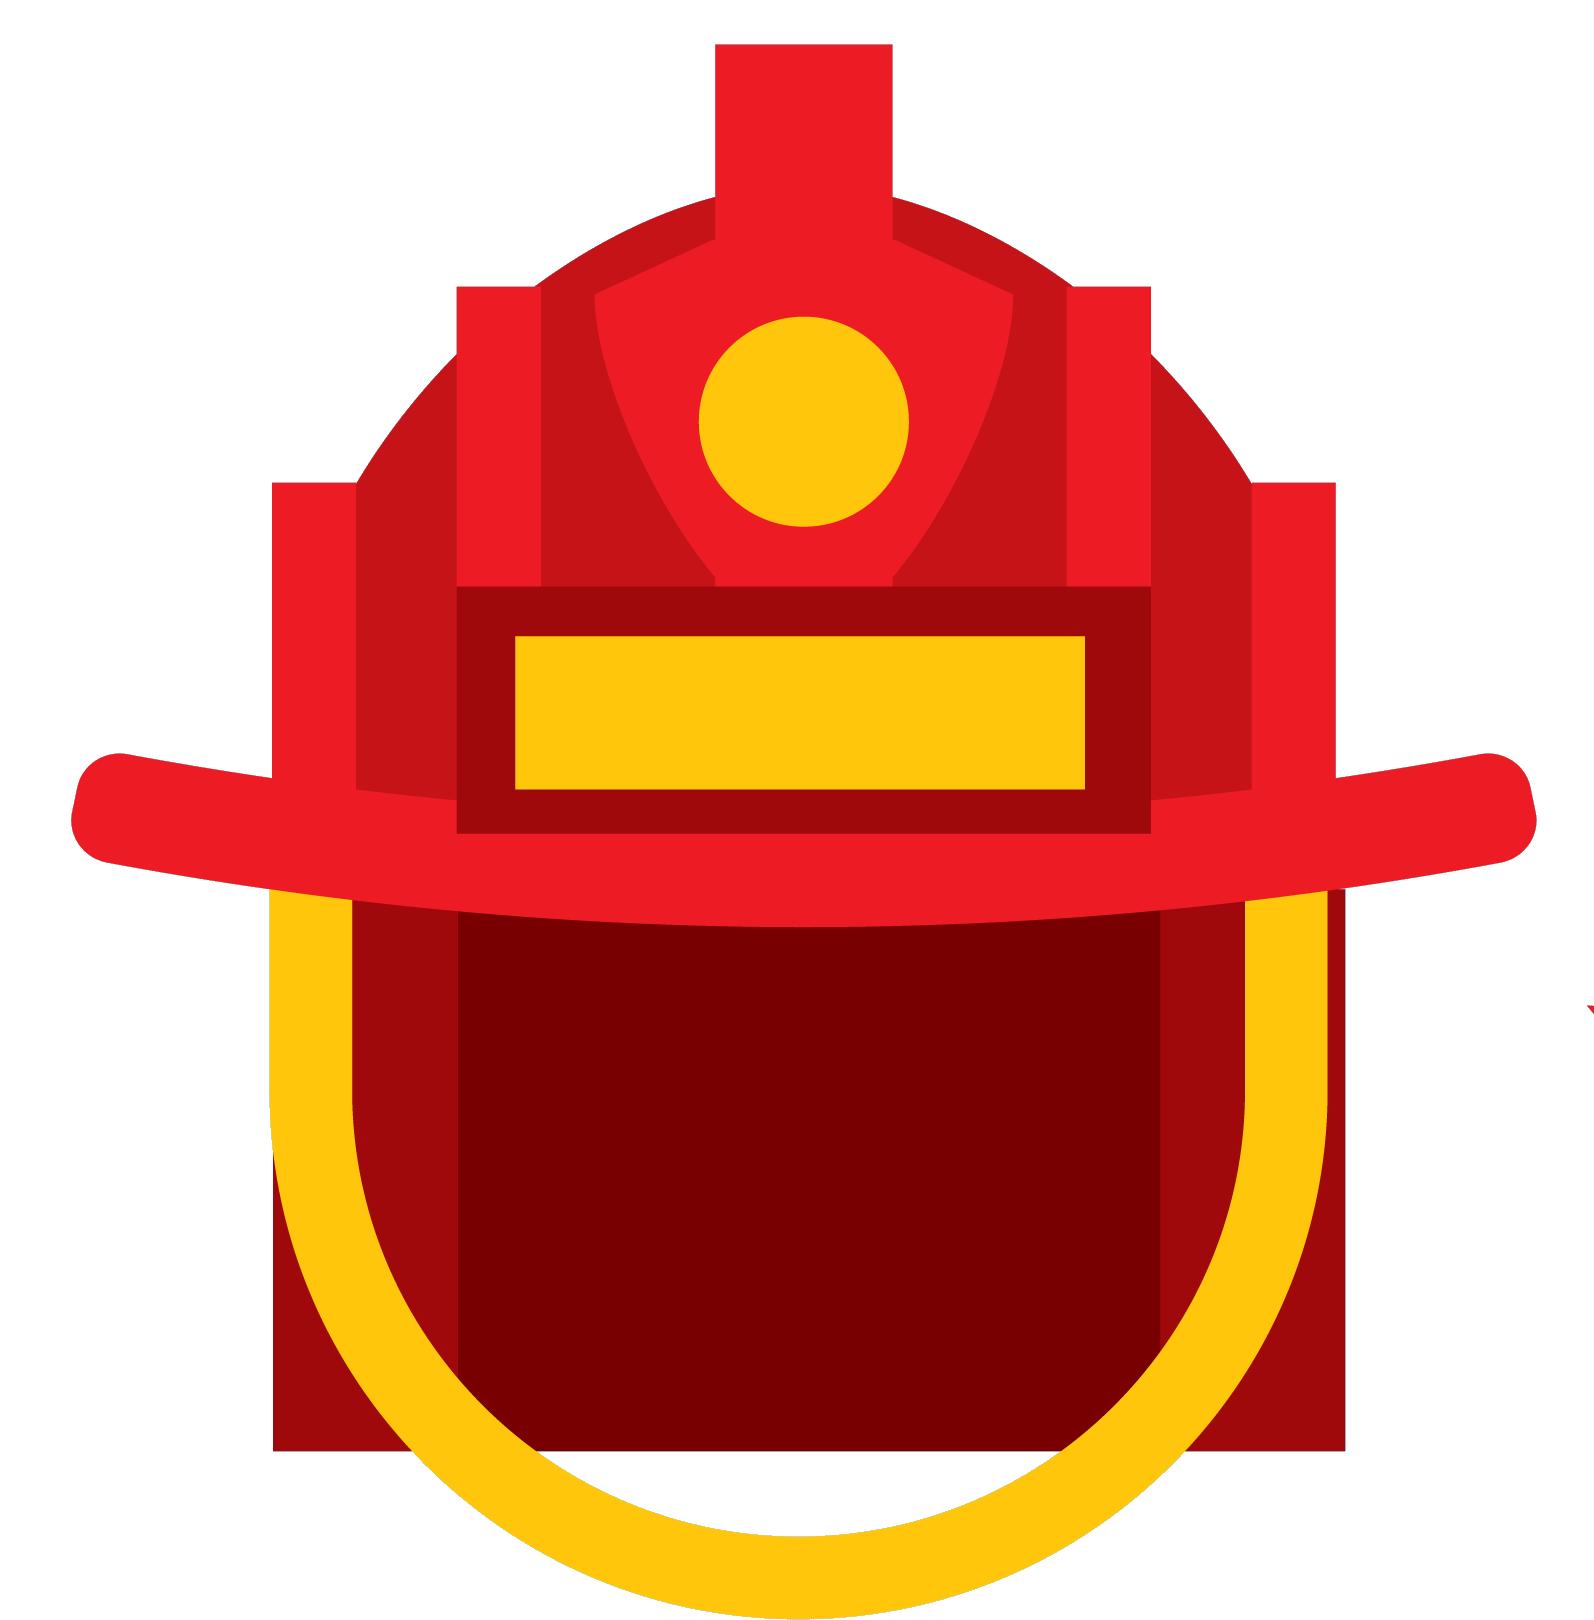 Firefighter clipart symbol. Helmet icon transprent